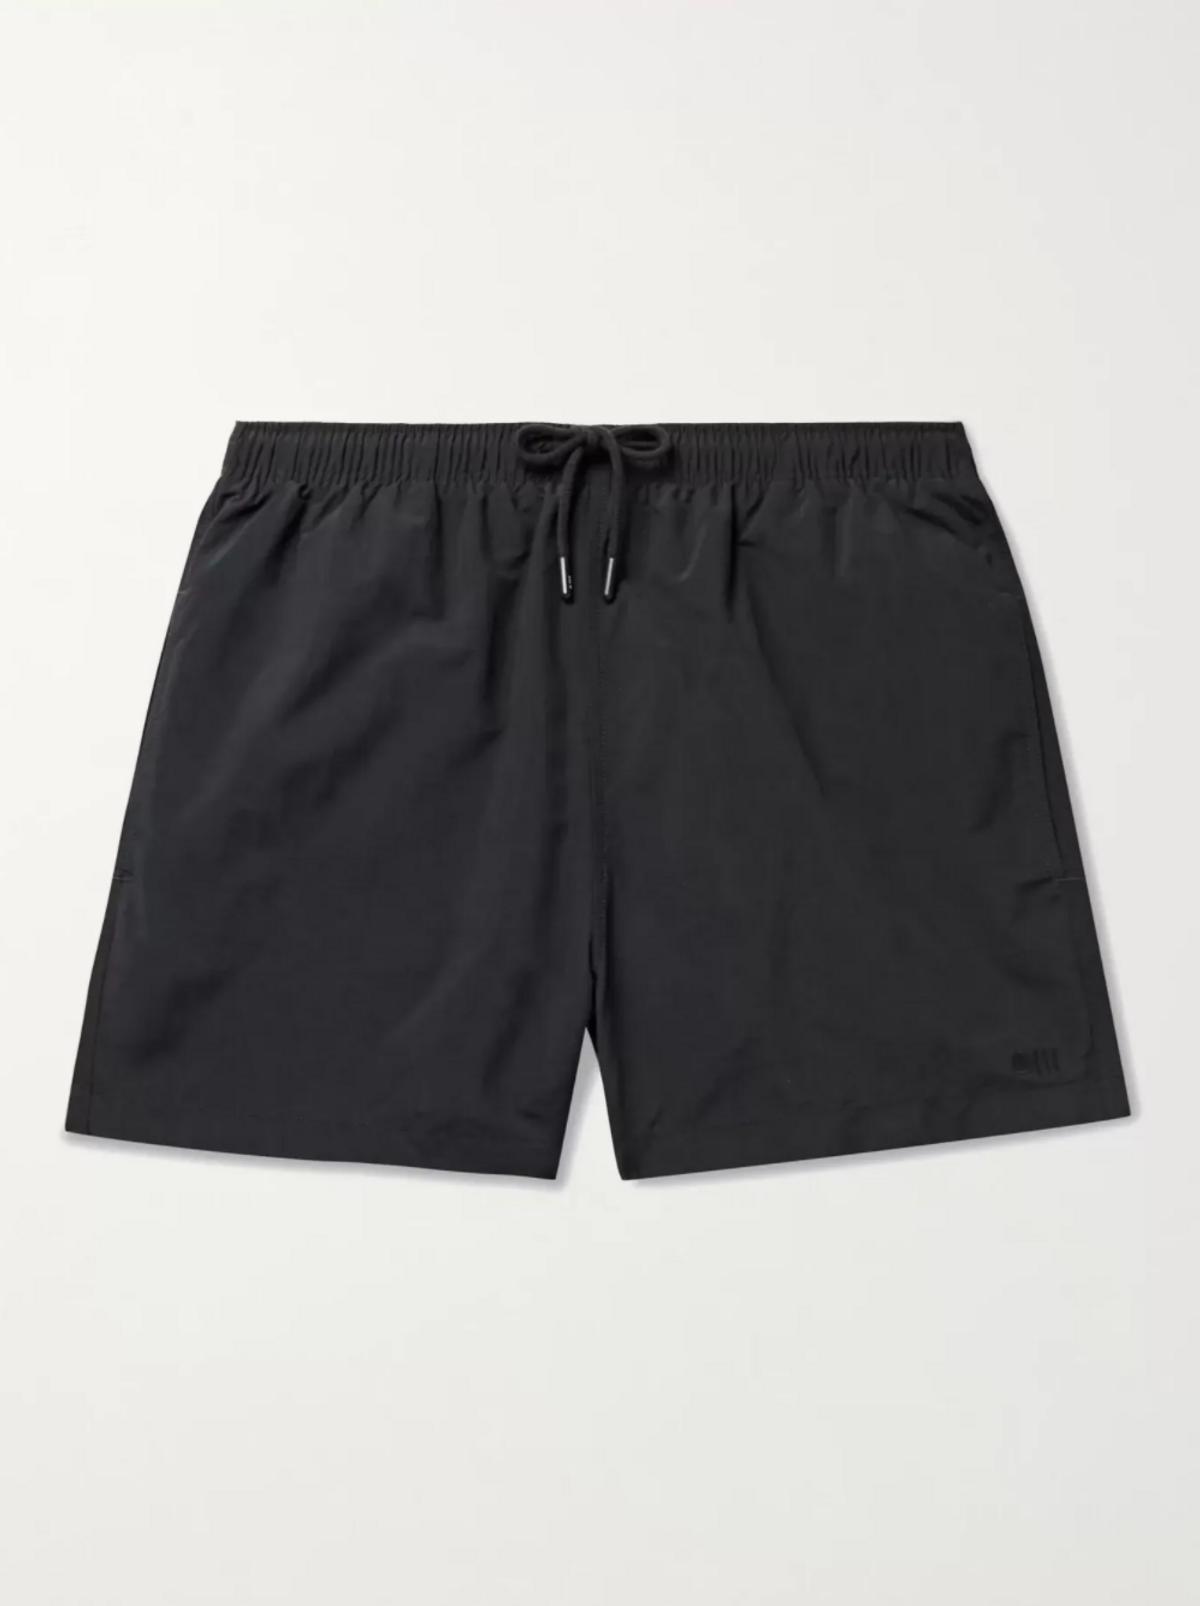 The Classic Mid-Length Swim Shorts